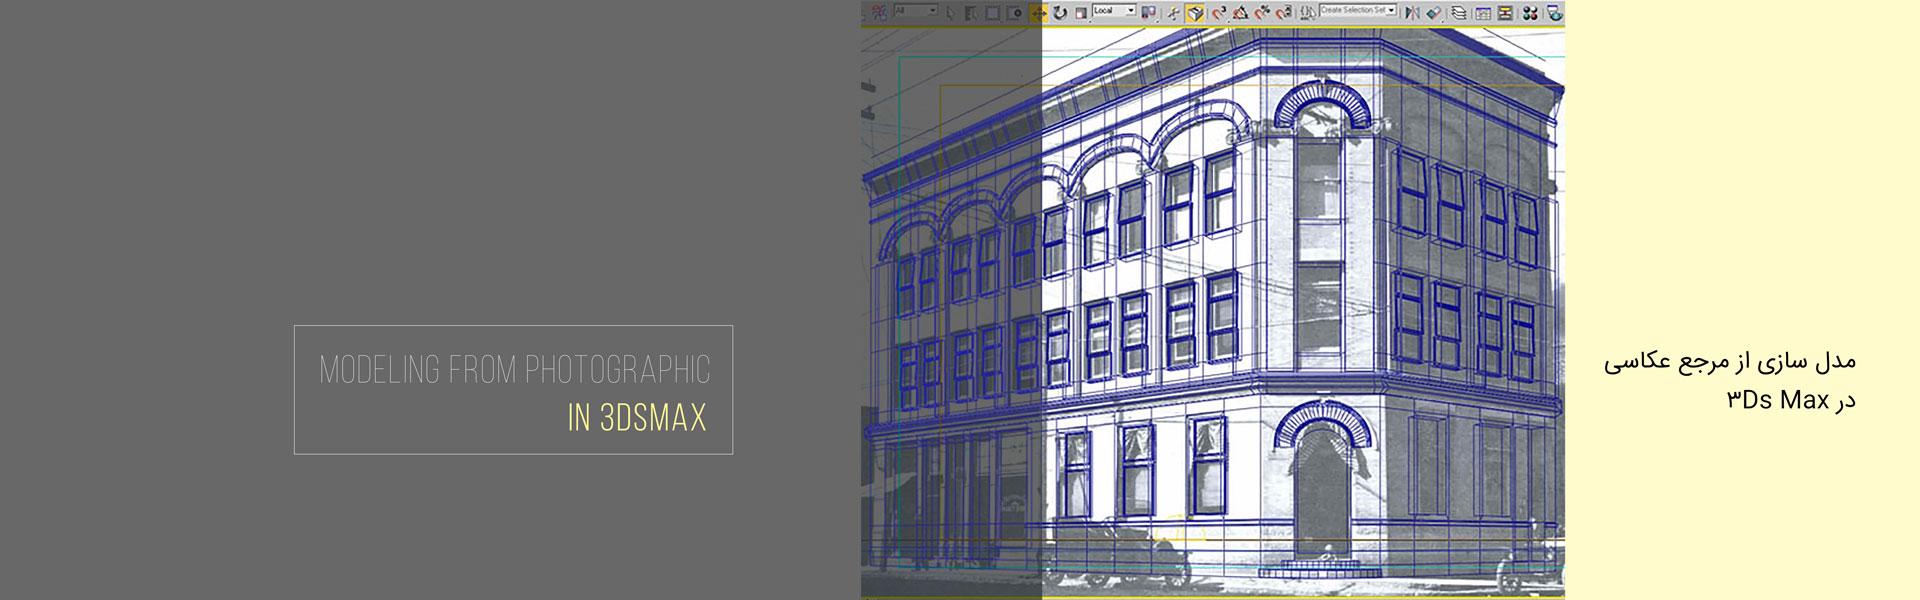 3dmax modeling photography - مدل سازی از مرجع عکاسی در 3Ds Max